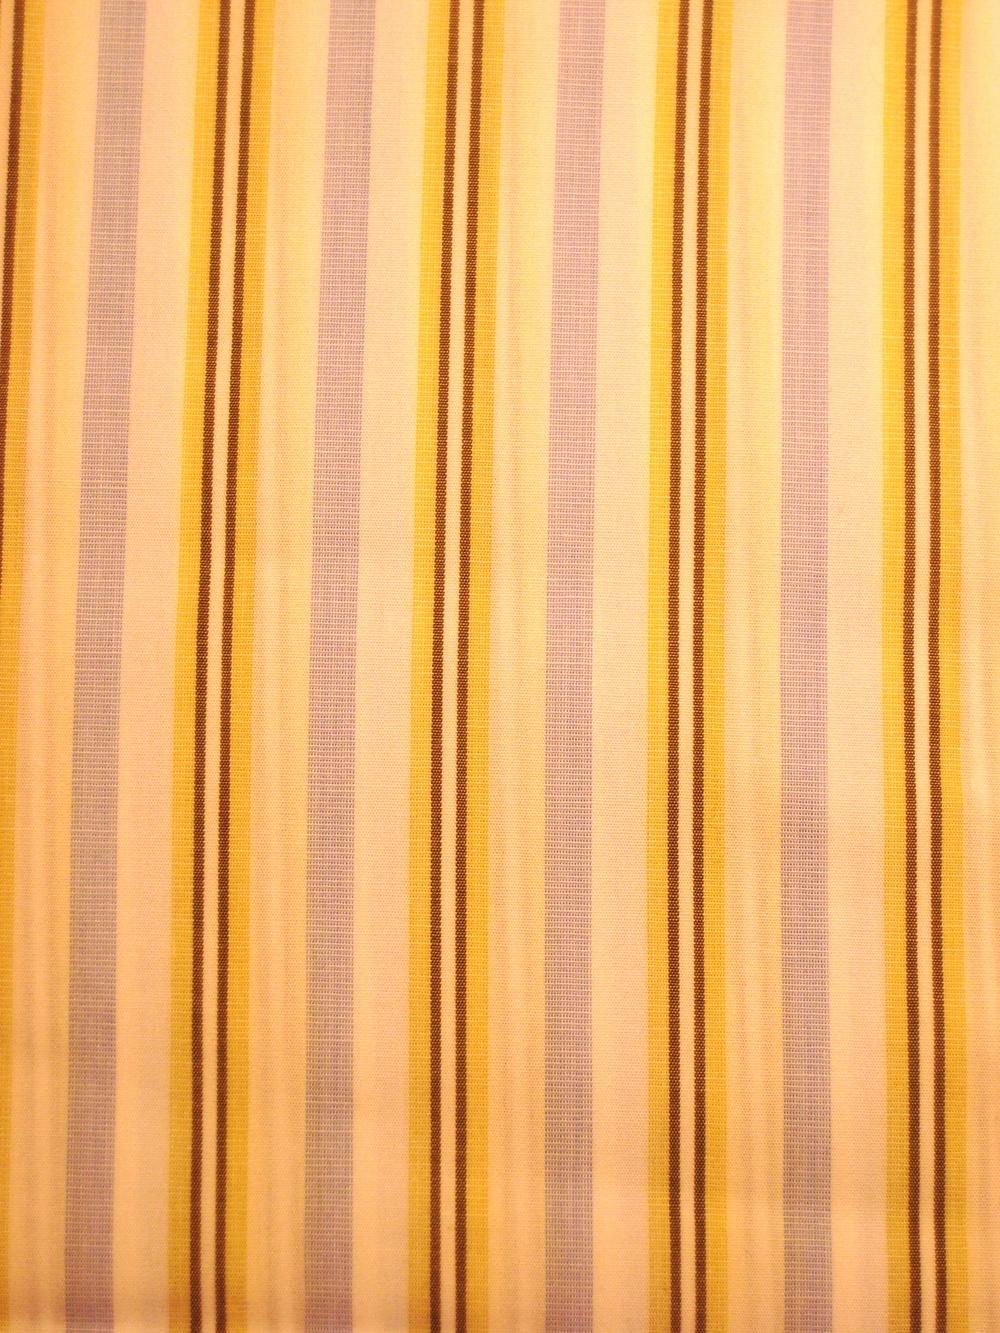 Yellow and Blue Stripe.jpg